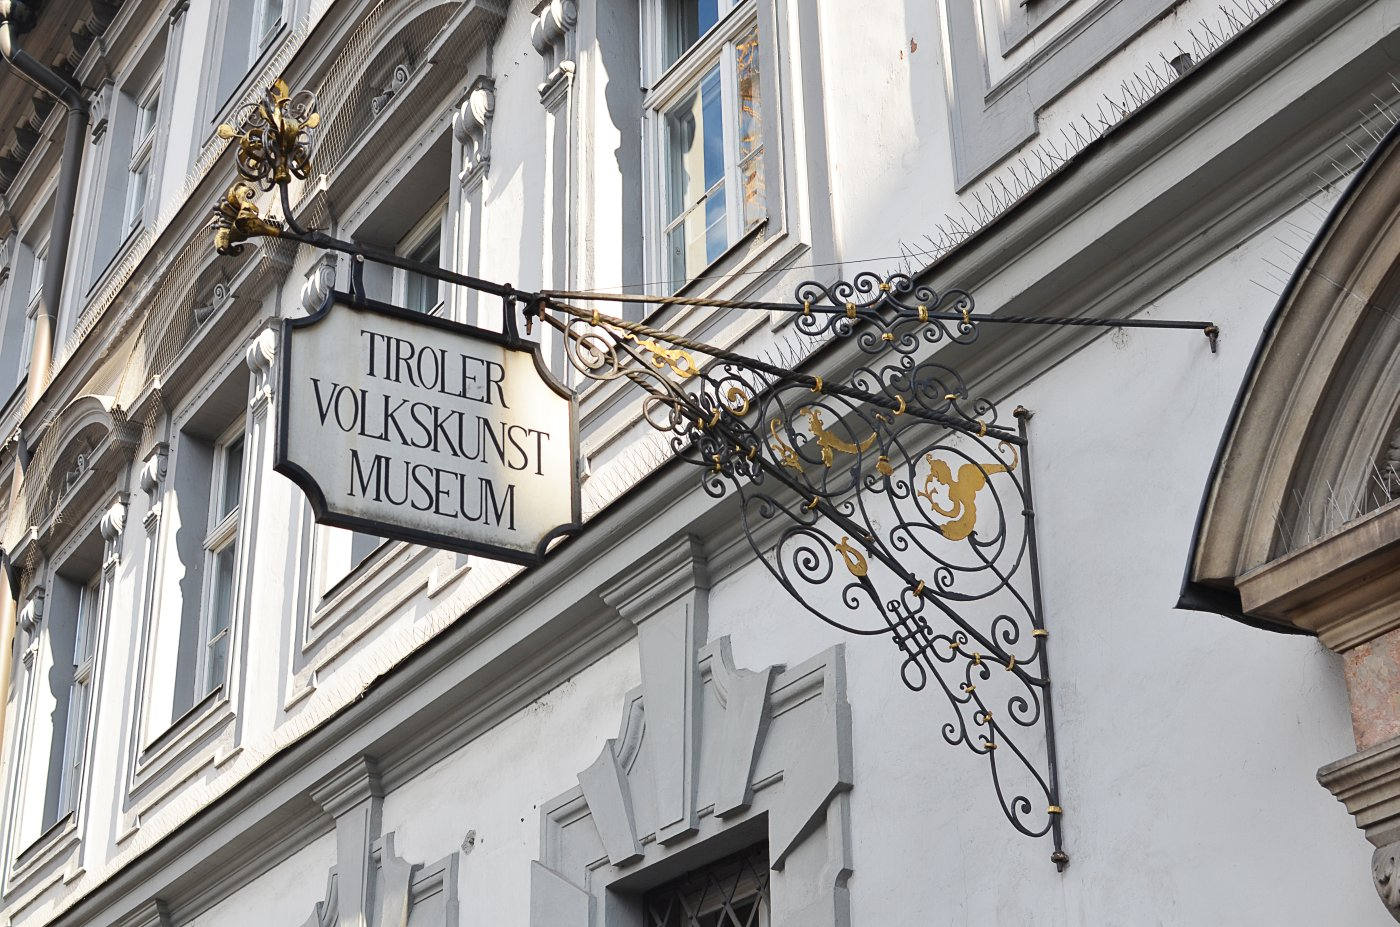 Innsbruck - Tyrolskie Muzeum Etnograficzne